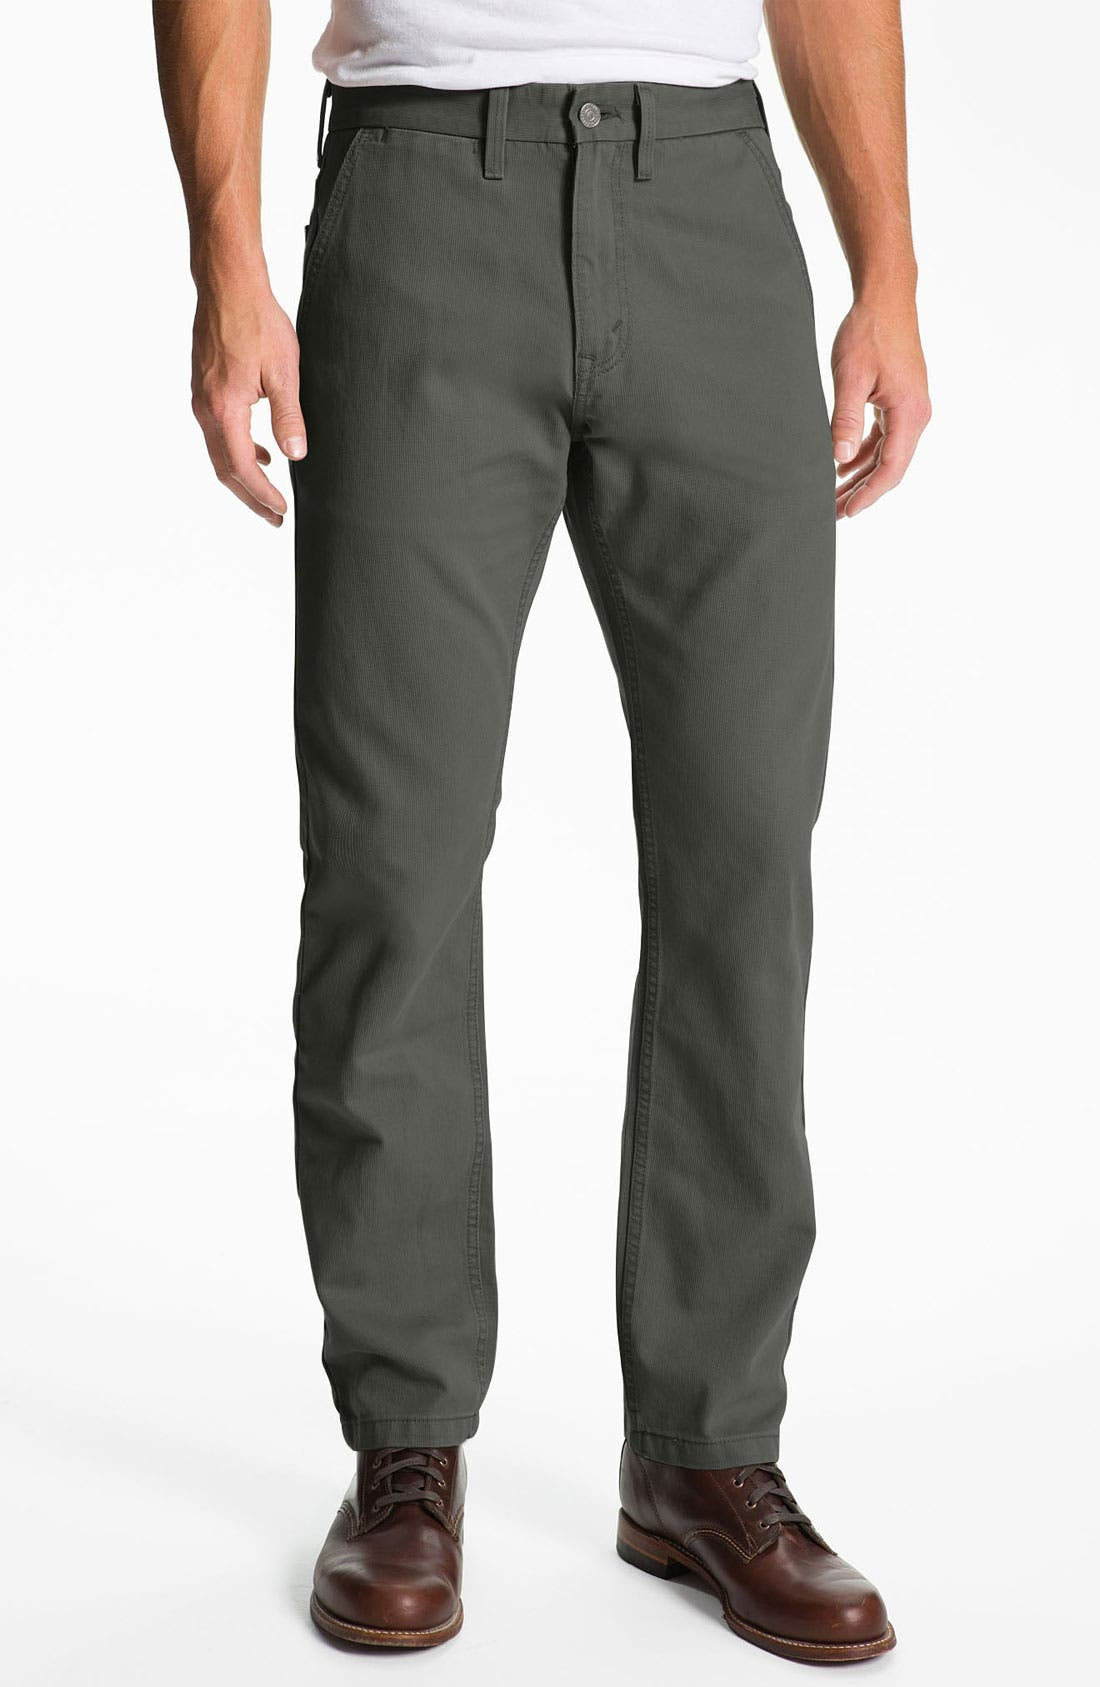 Alternate Image 1 Selected - Levi's® '505 Bedford' Slim Straight Leg Pants